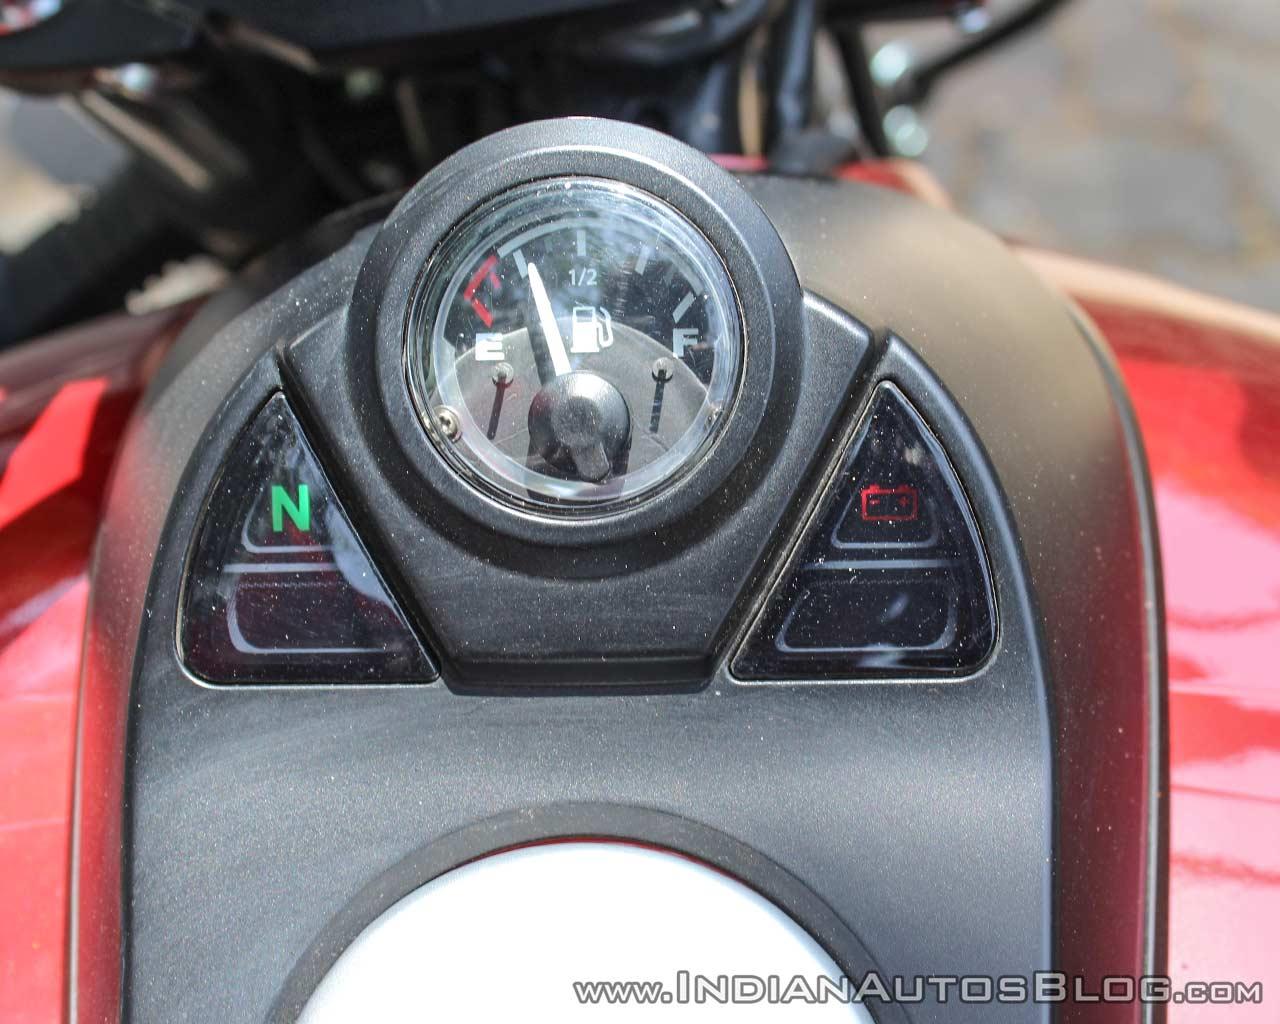 Bajaj Avenger 180 Street test ride review tank console